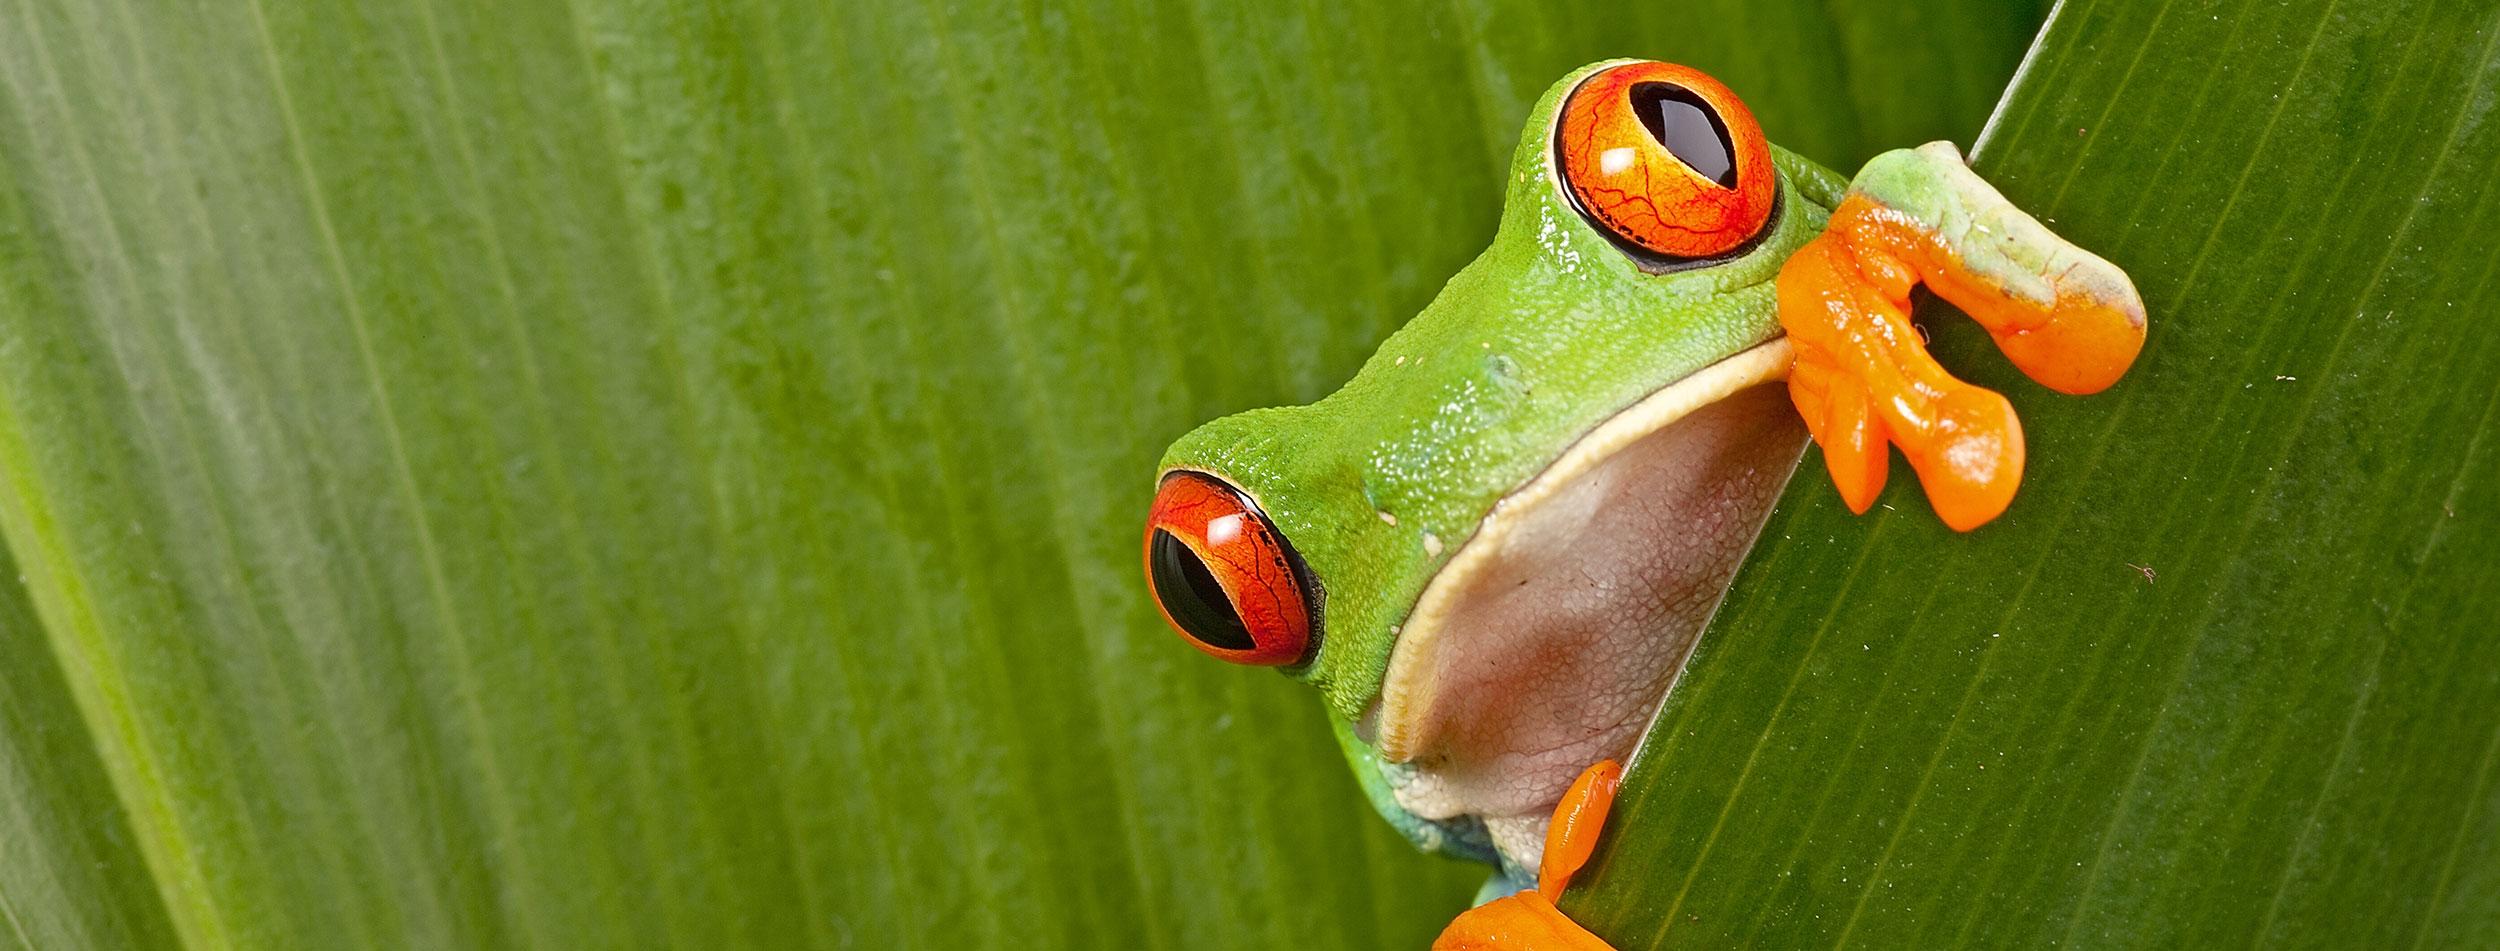 datos interesantes sobre Costa Rica